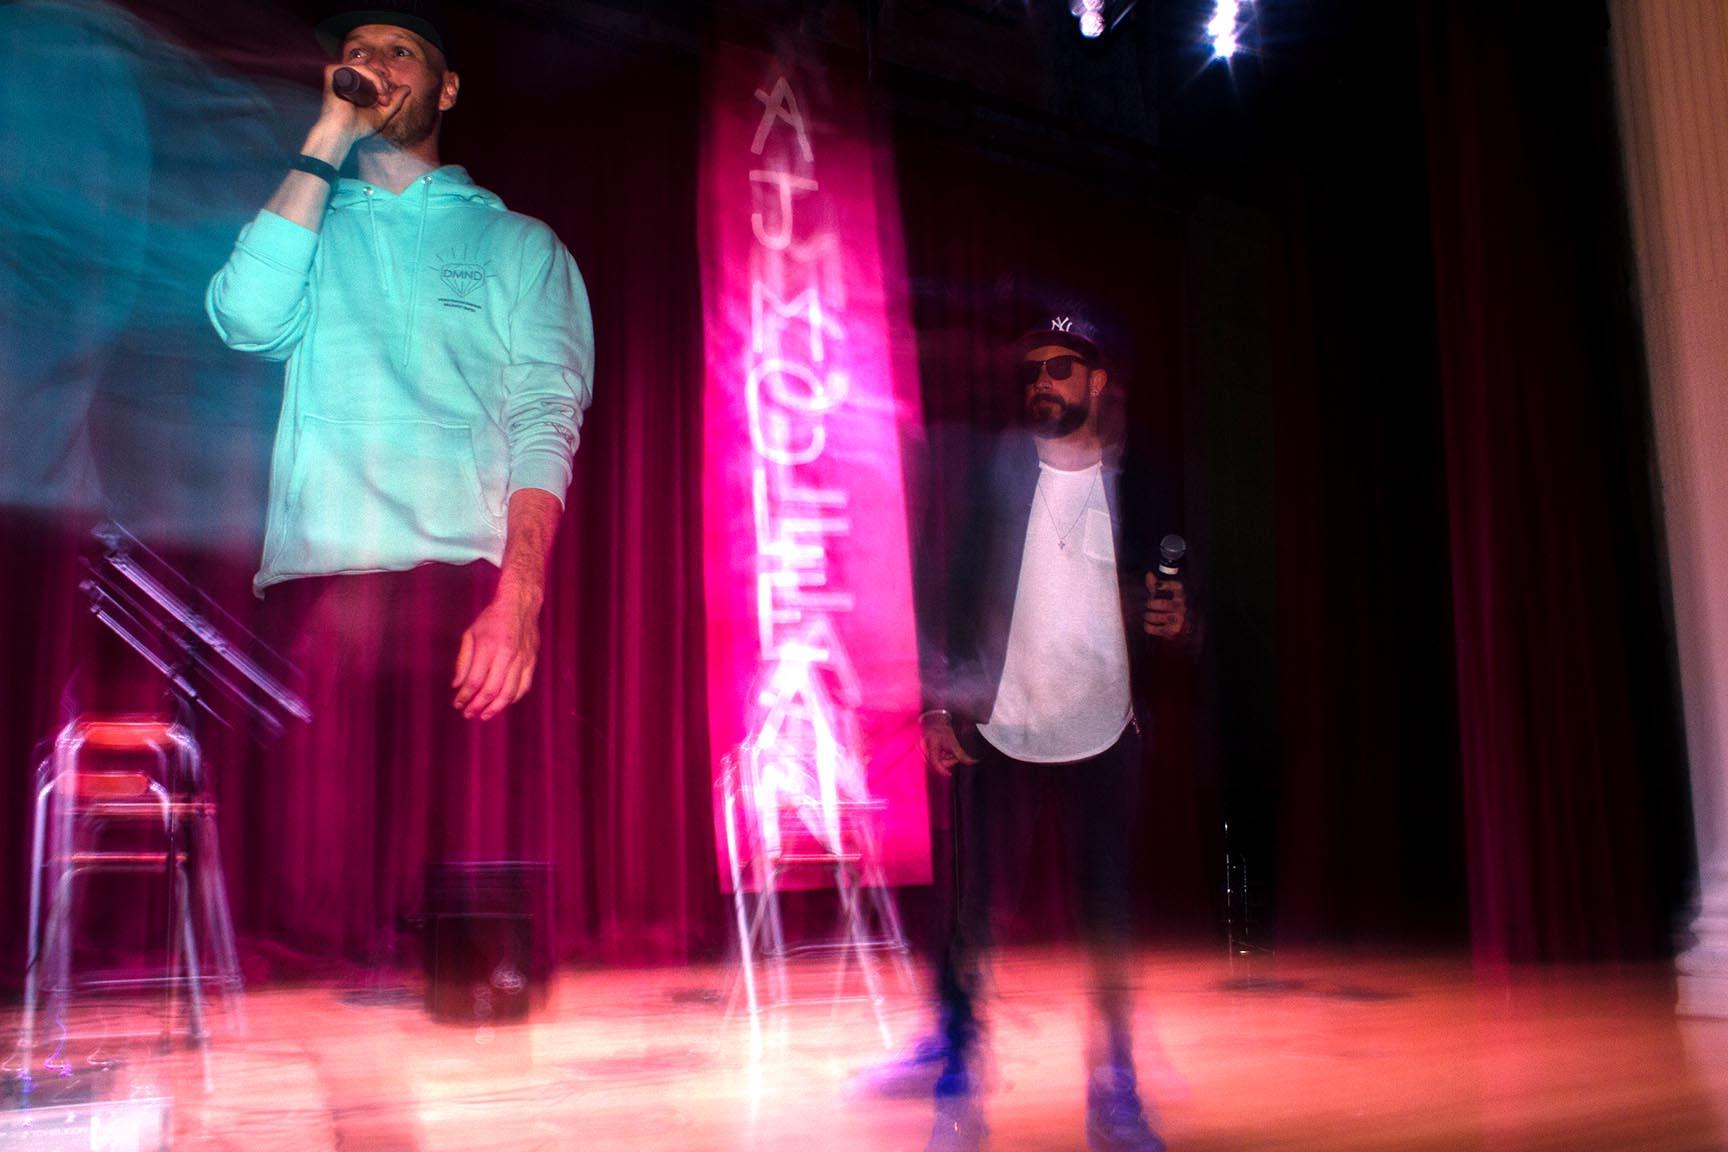 Music producer Jordan Omly and AJ McLean